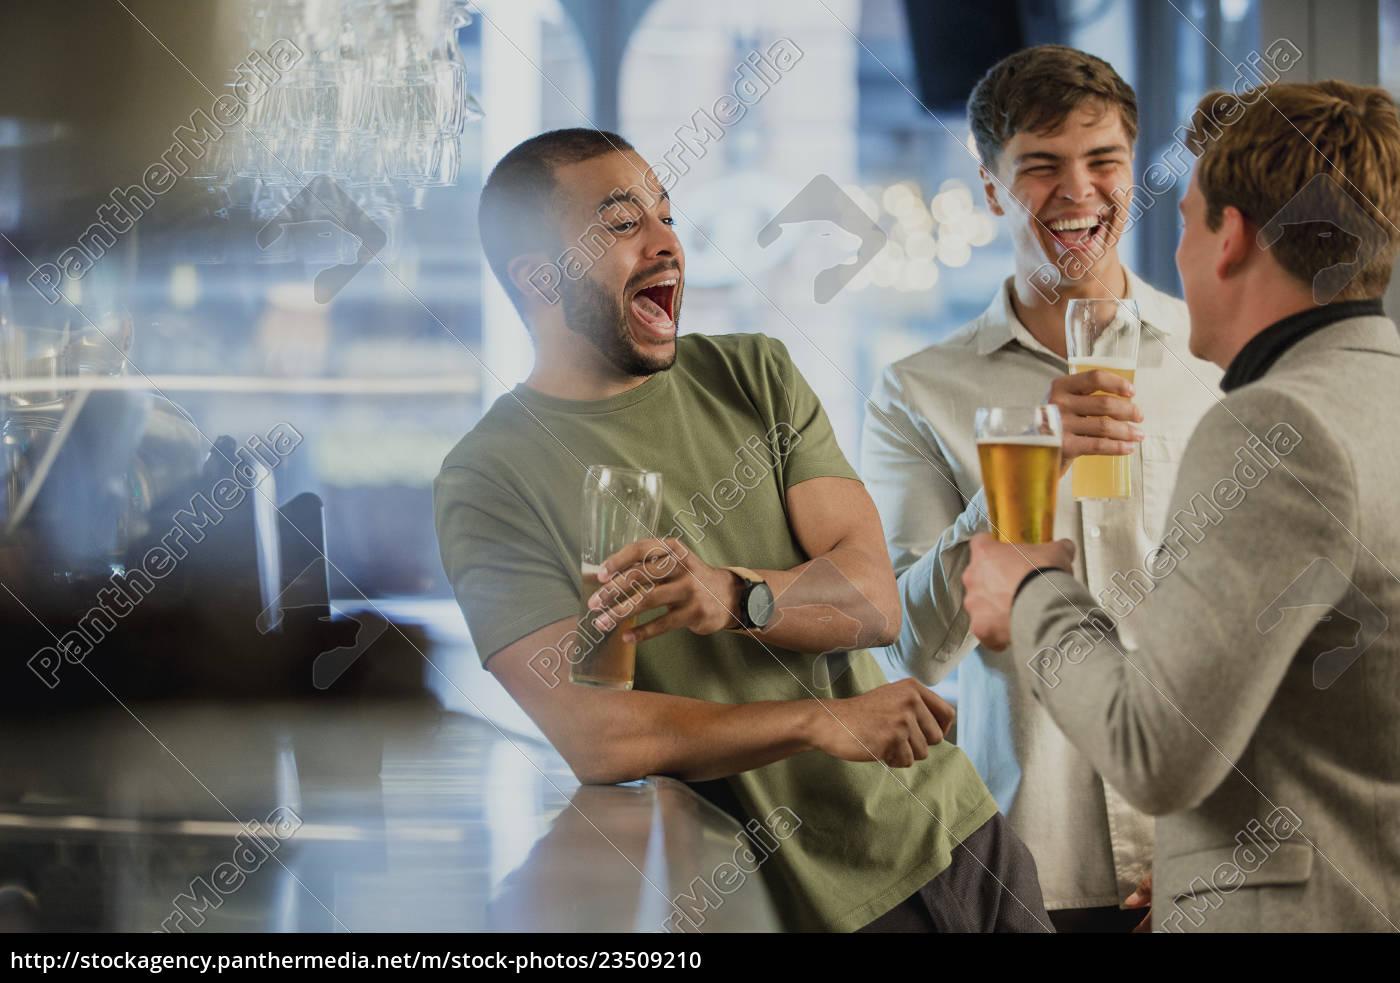 enjoying, drinks, after, work - 23509210